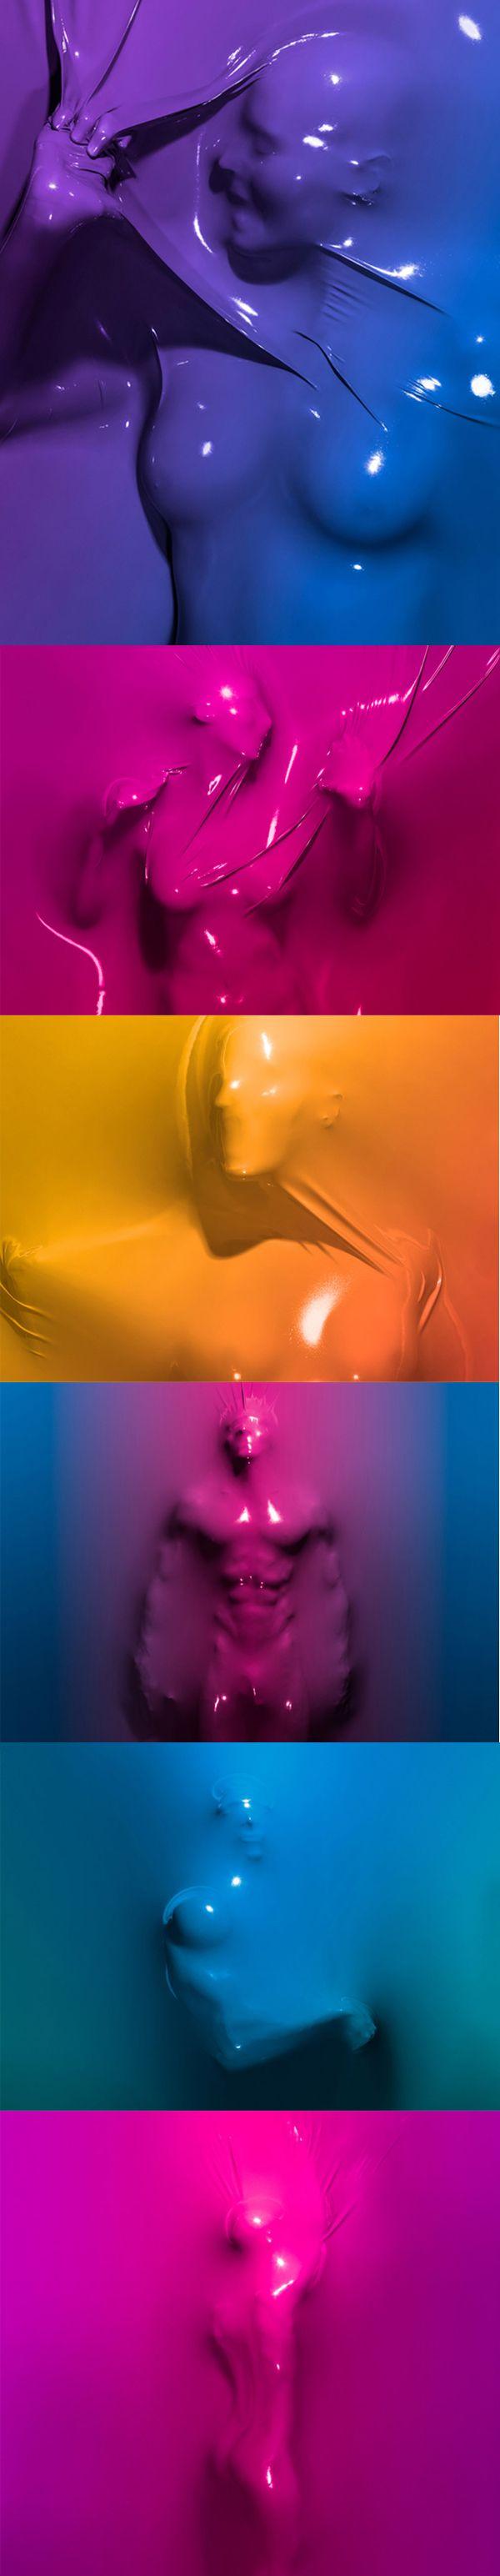 Skindeep by Julien Palast